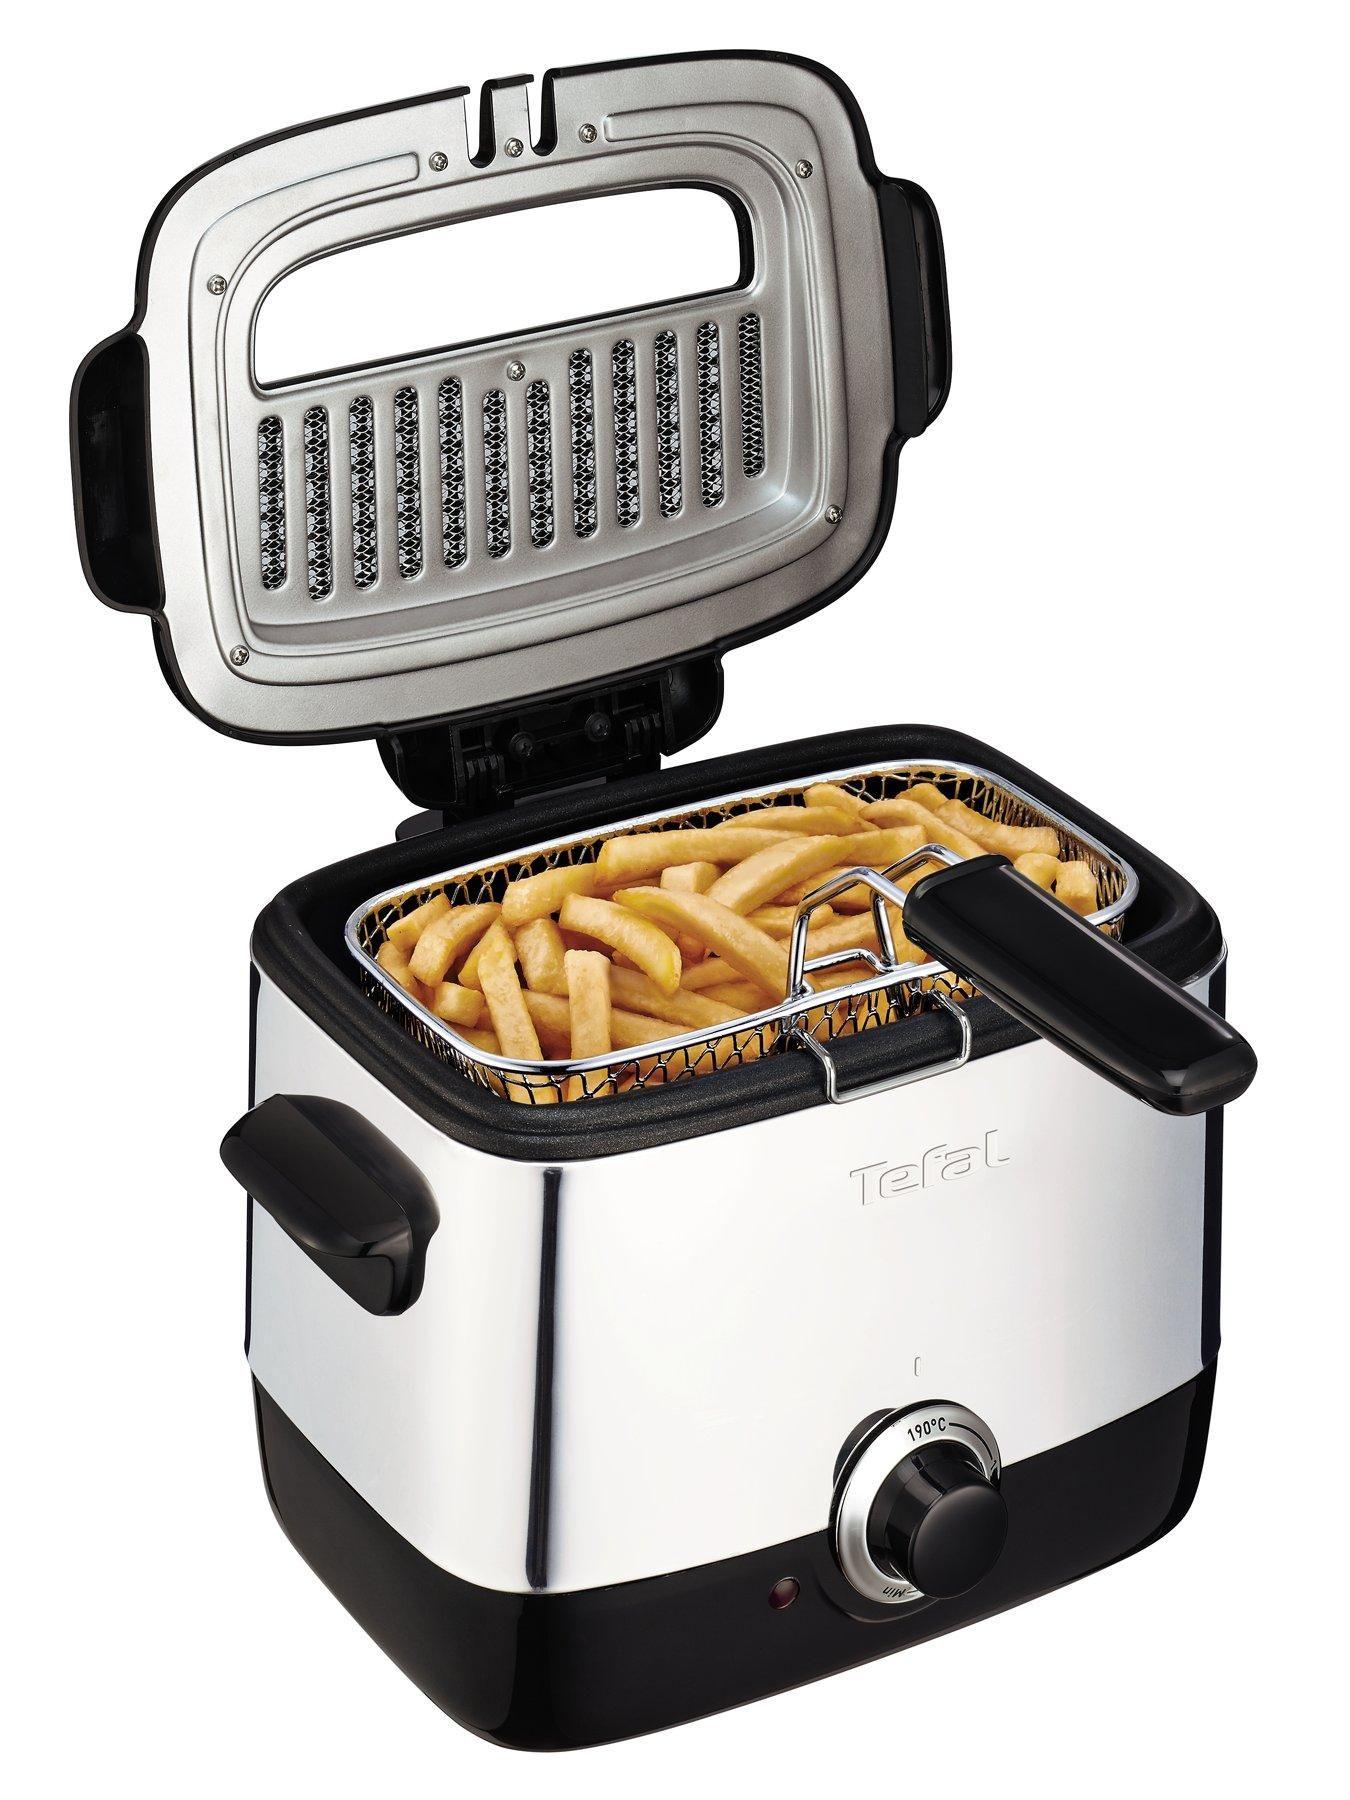 Tefal FF220040 Mini Deep Fryer, 0.6kg Capacity, 1000W